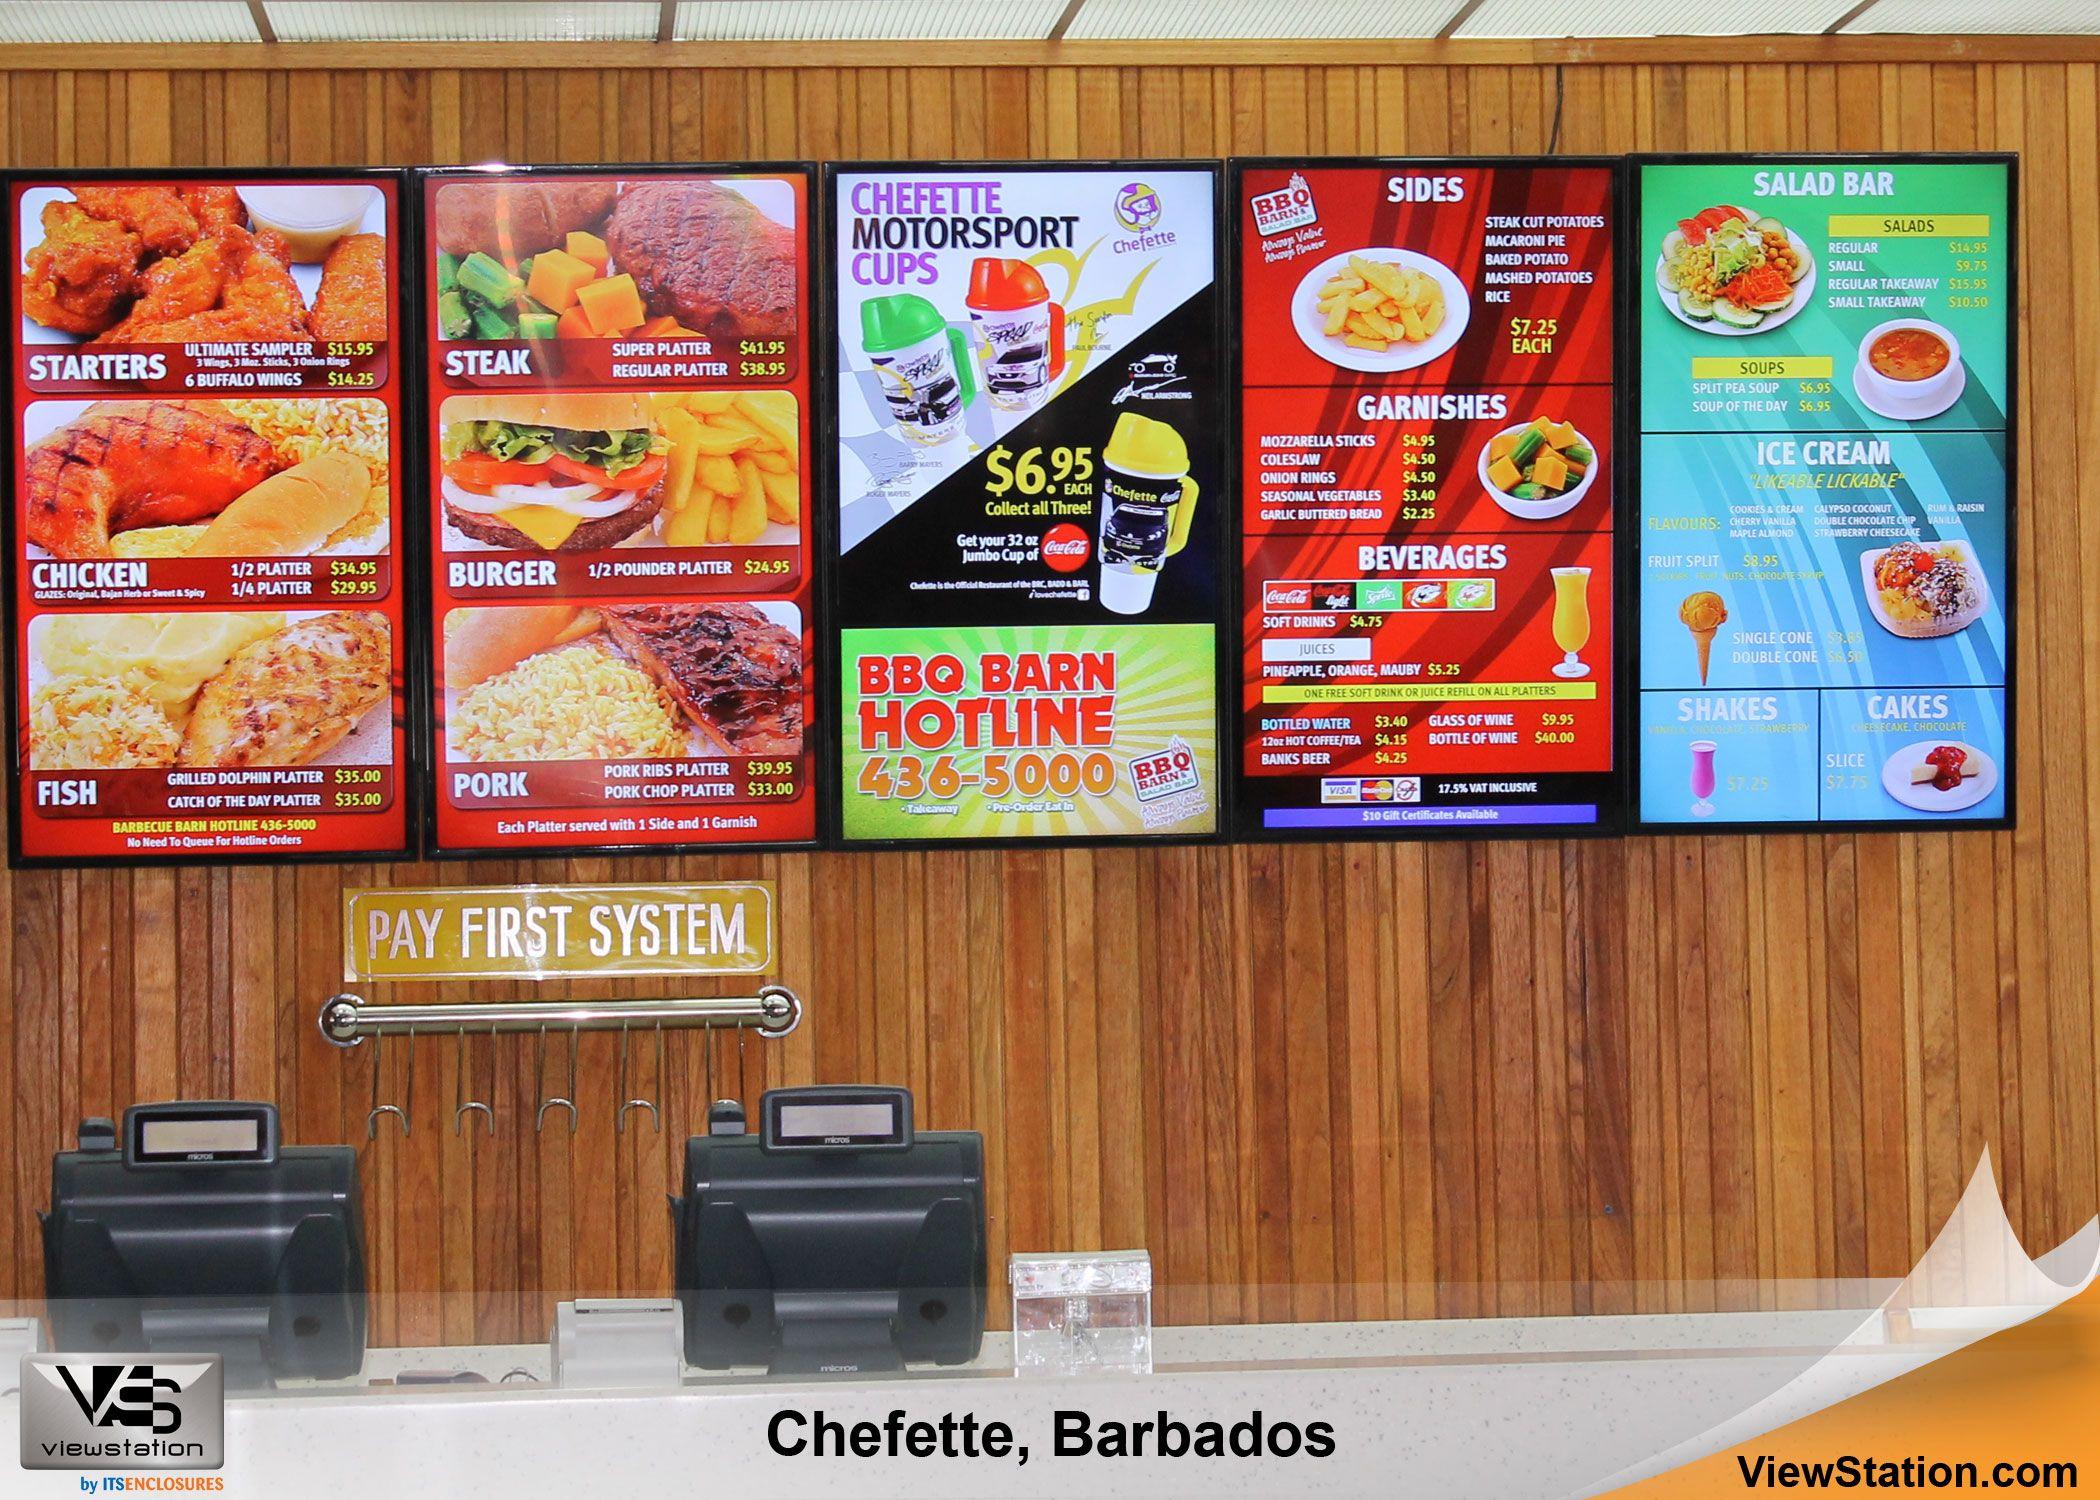 chefette barbados caribbean islands viewstation qsr quick service